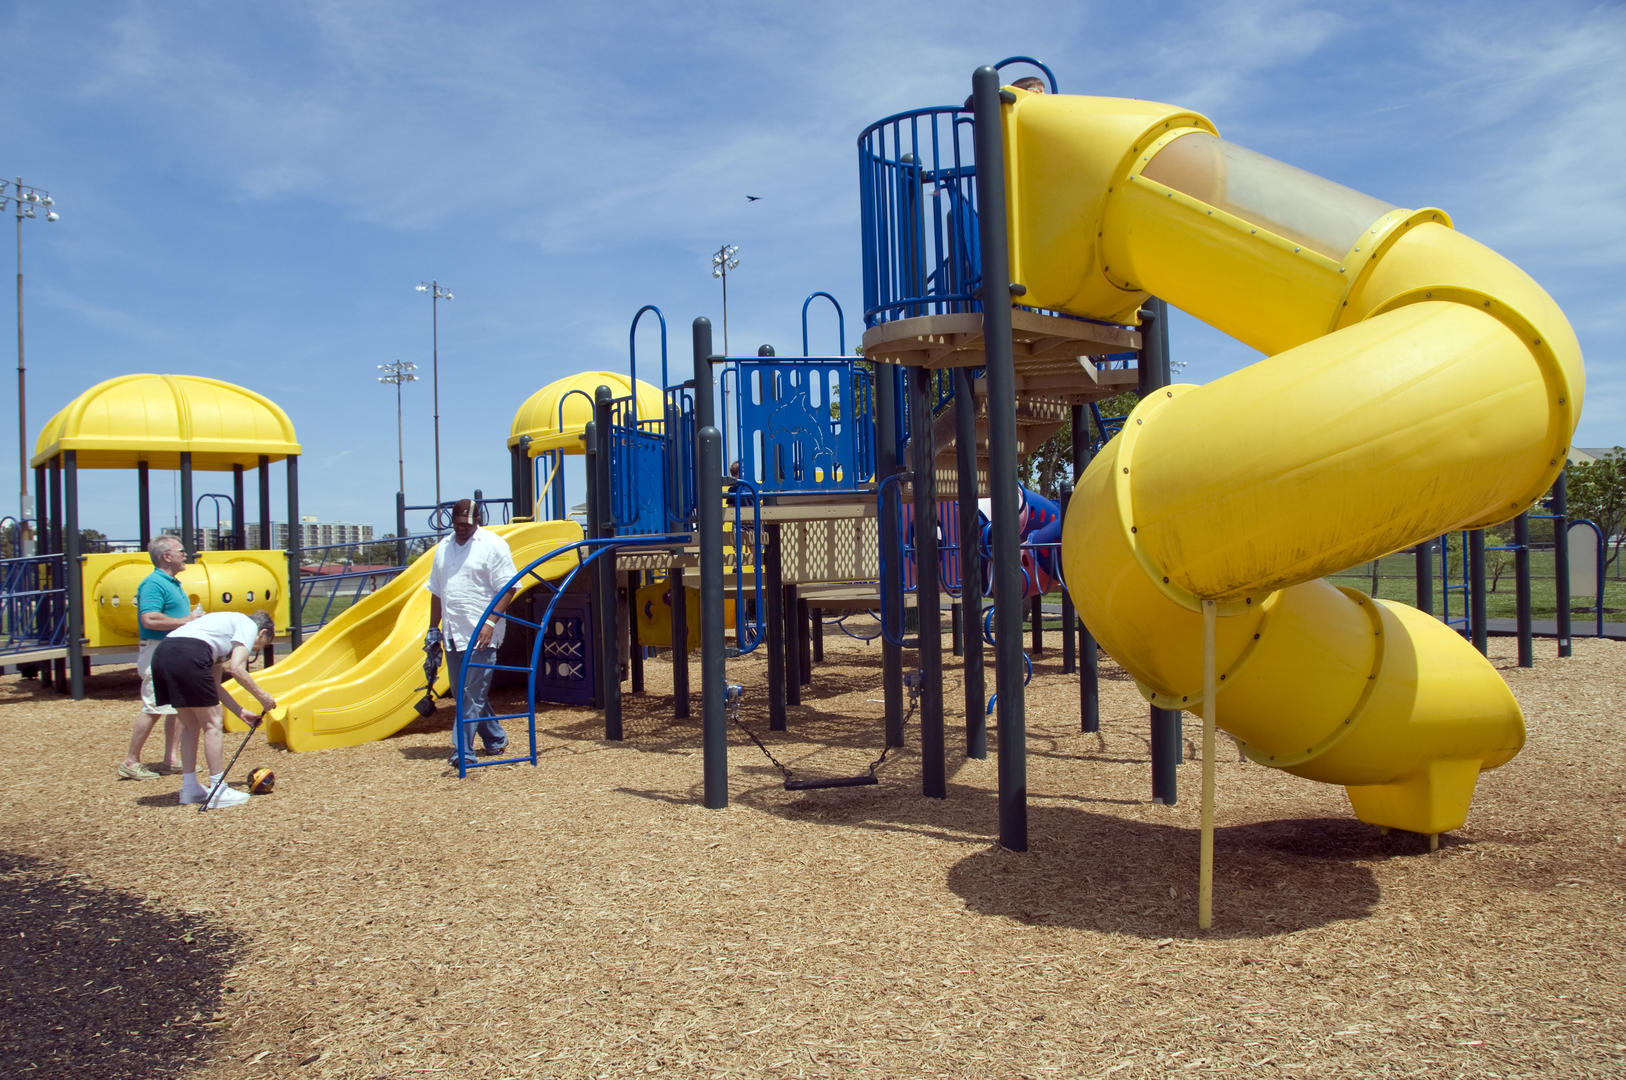 Nearby Northside Park Playground